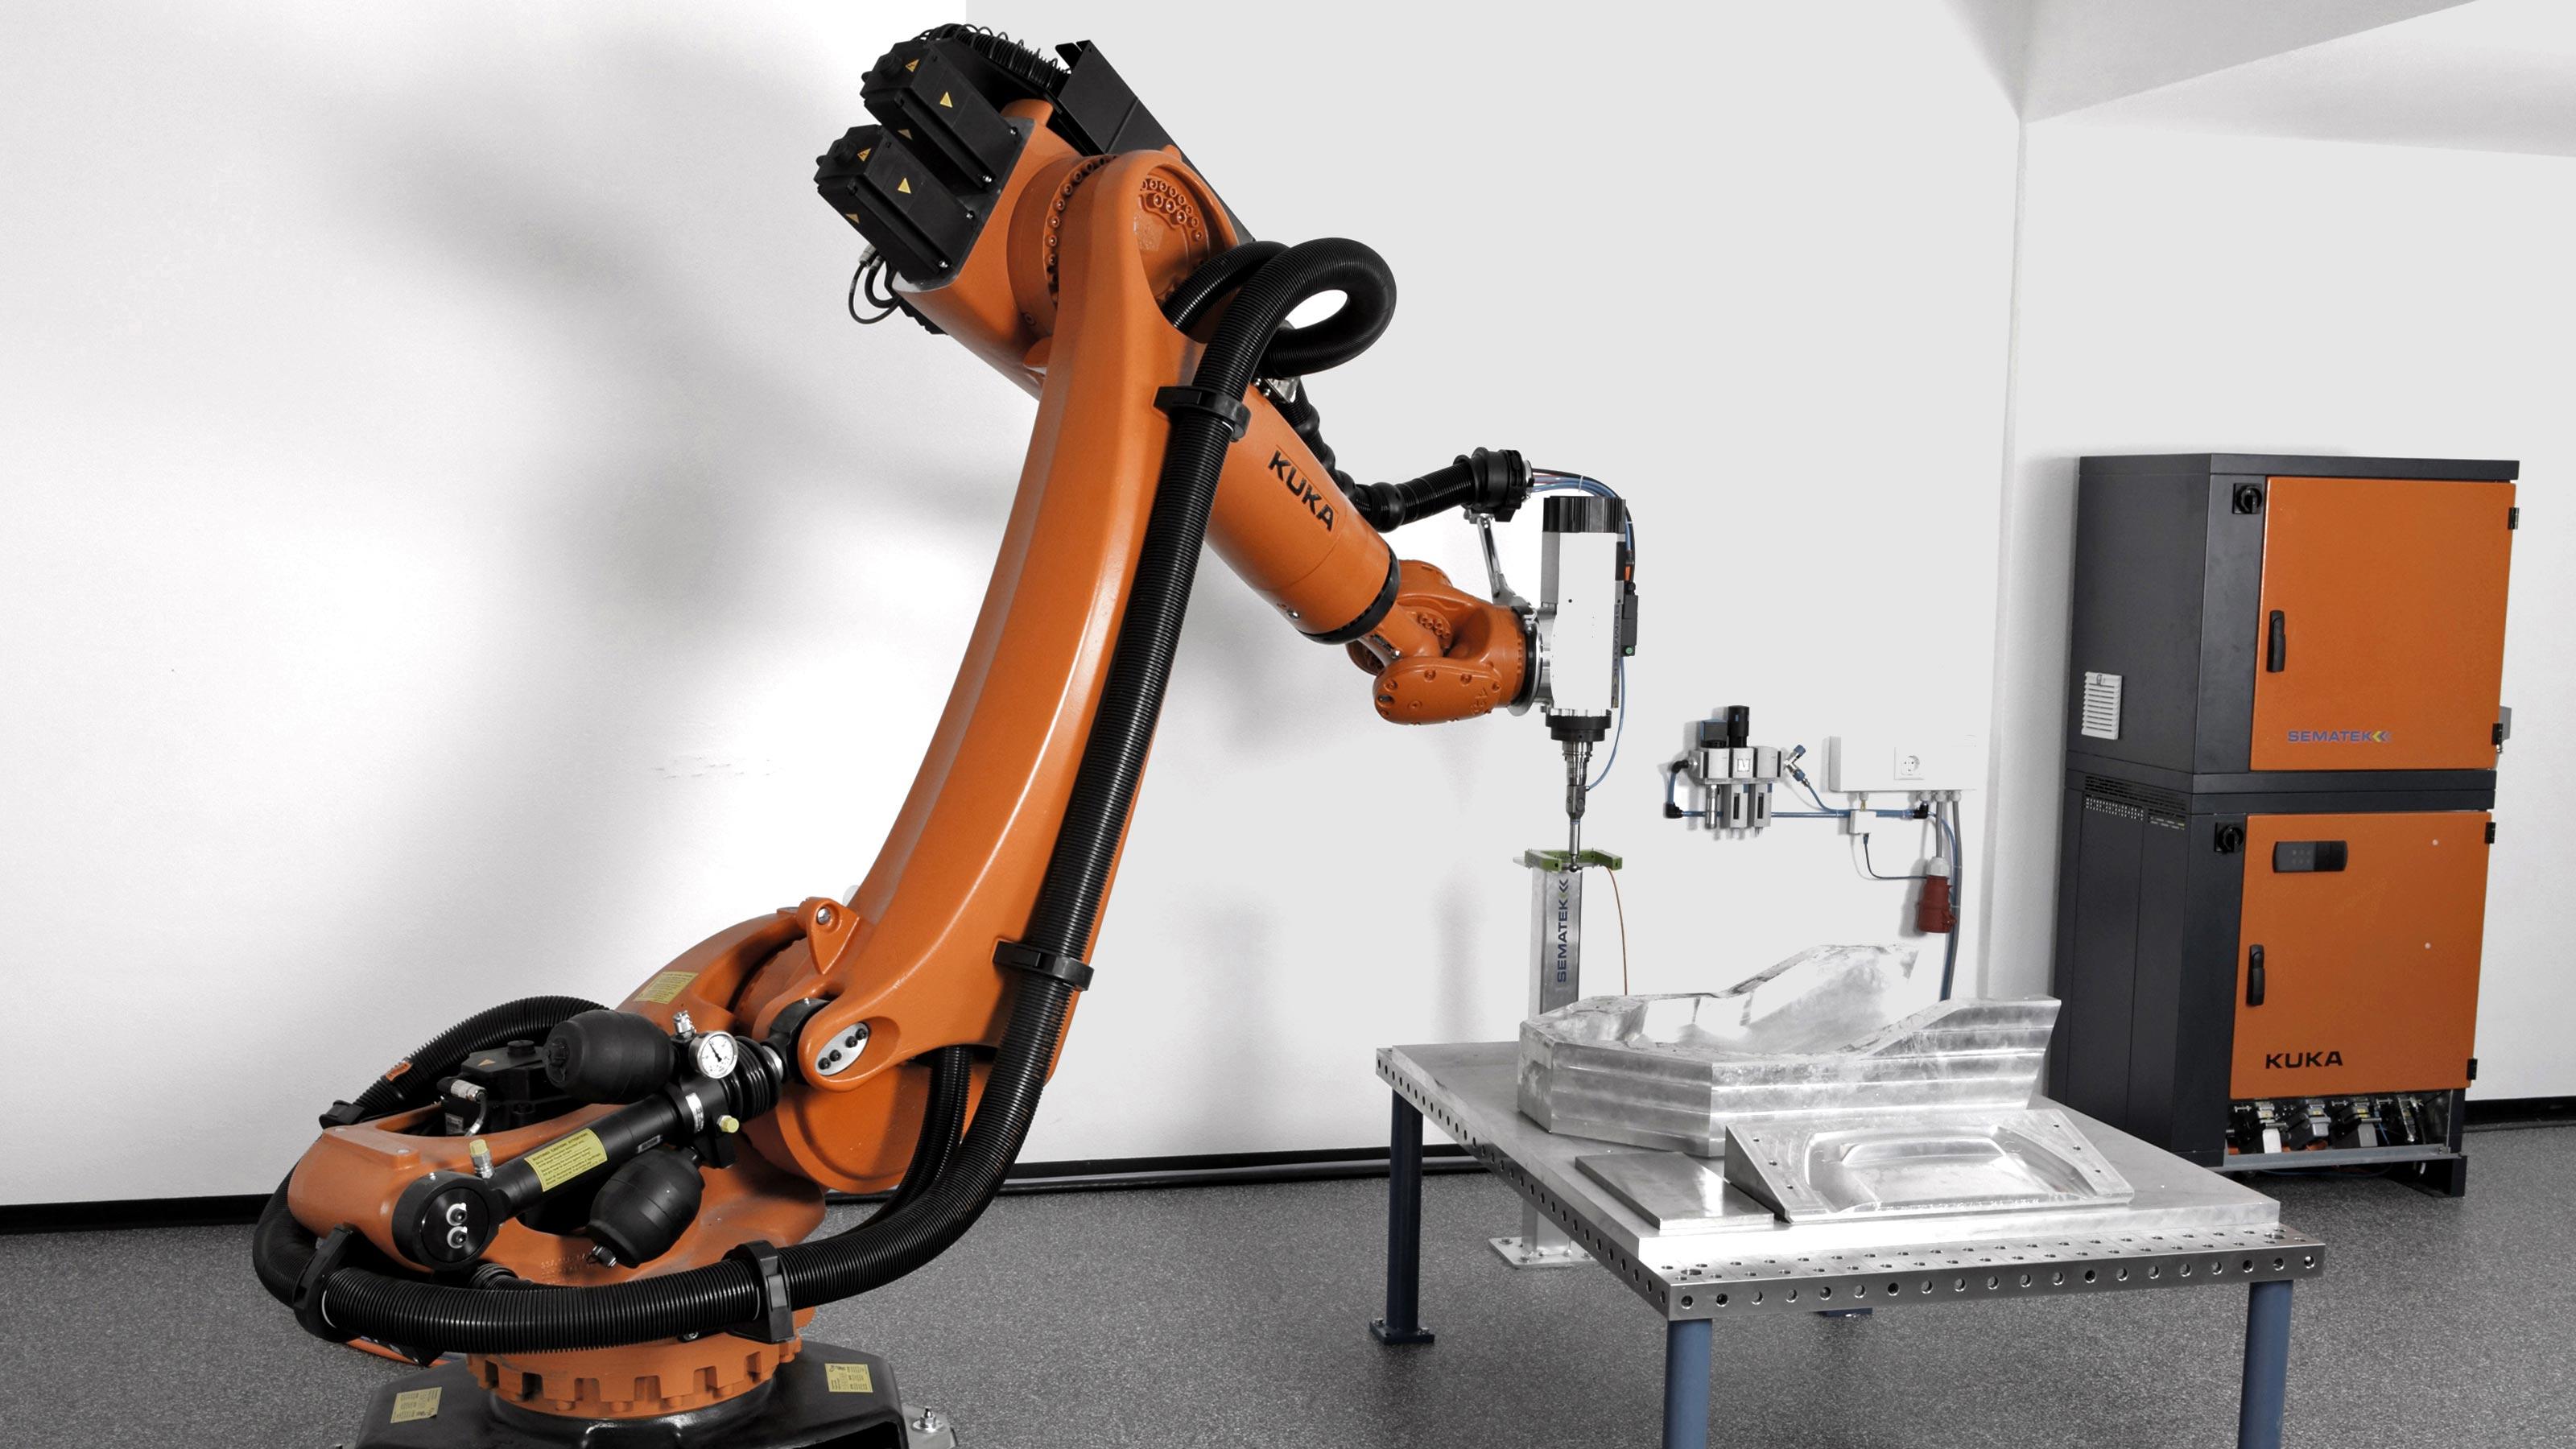 Kuka Case Studies Kuka Robots At Sematek Kuka Ag